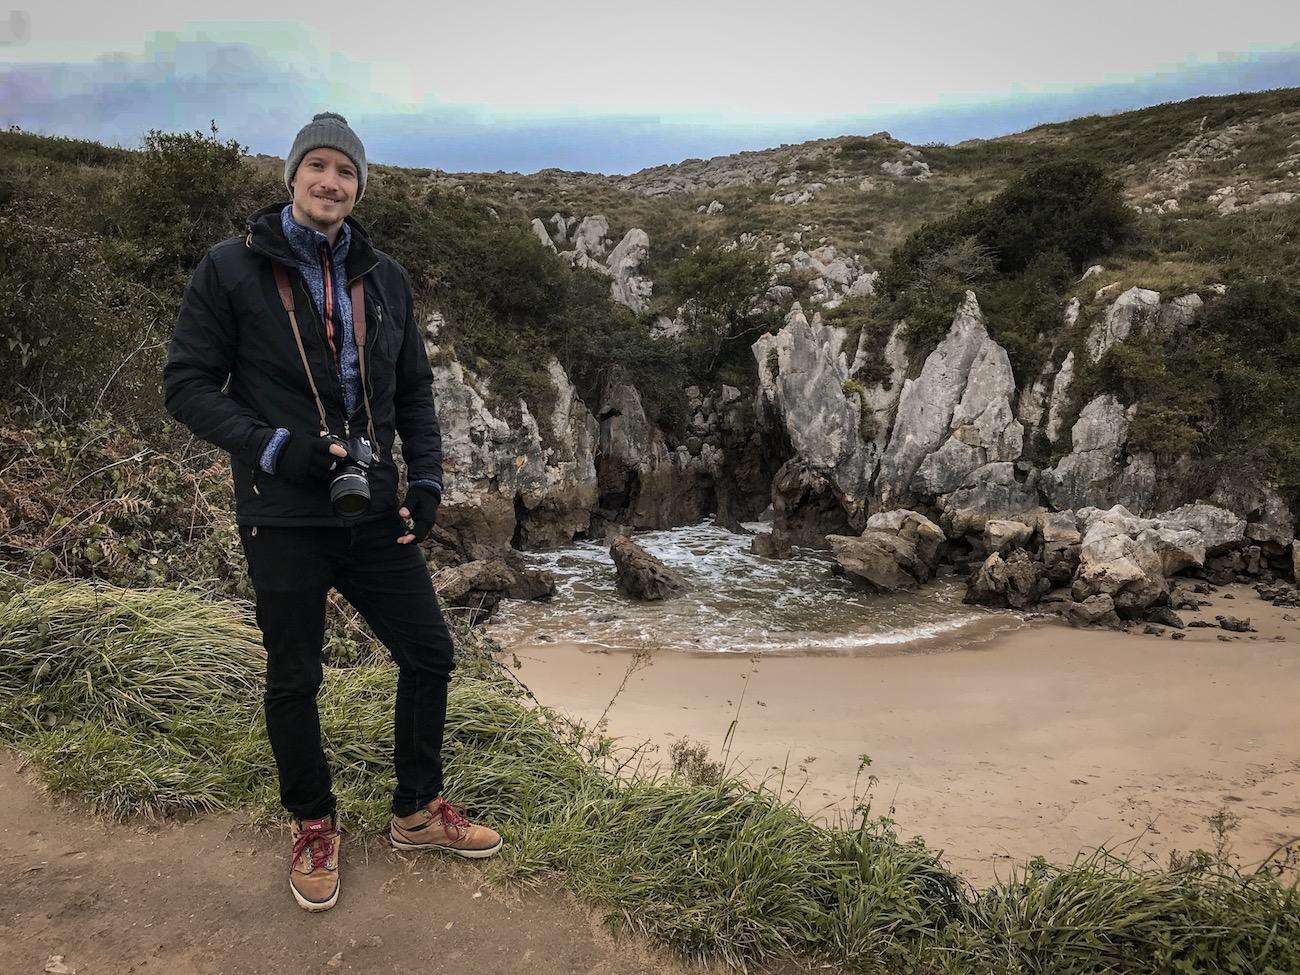 Playa de Gulpiyur, Asturias - the smallest beach in the world - northern Spain